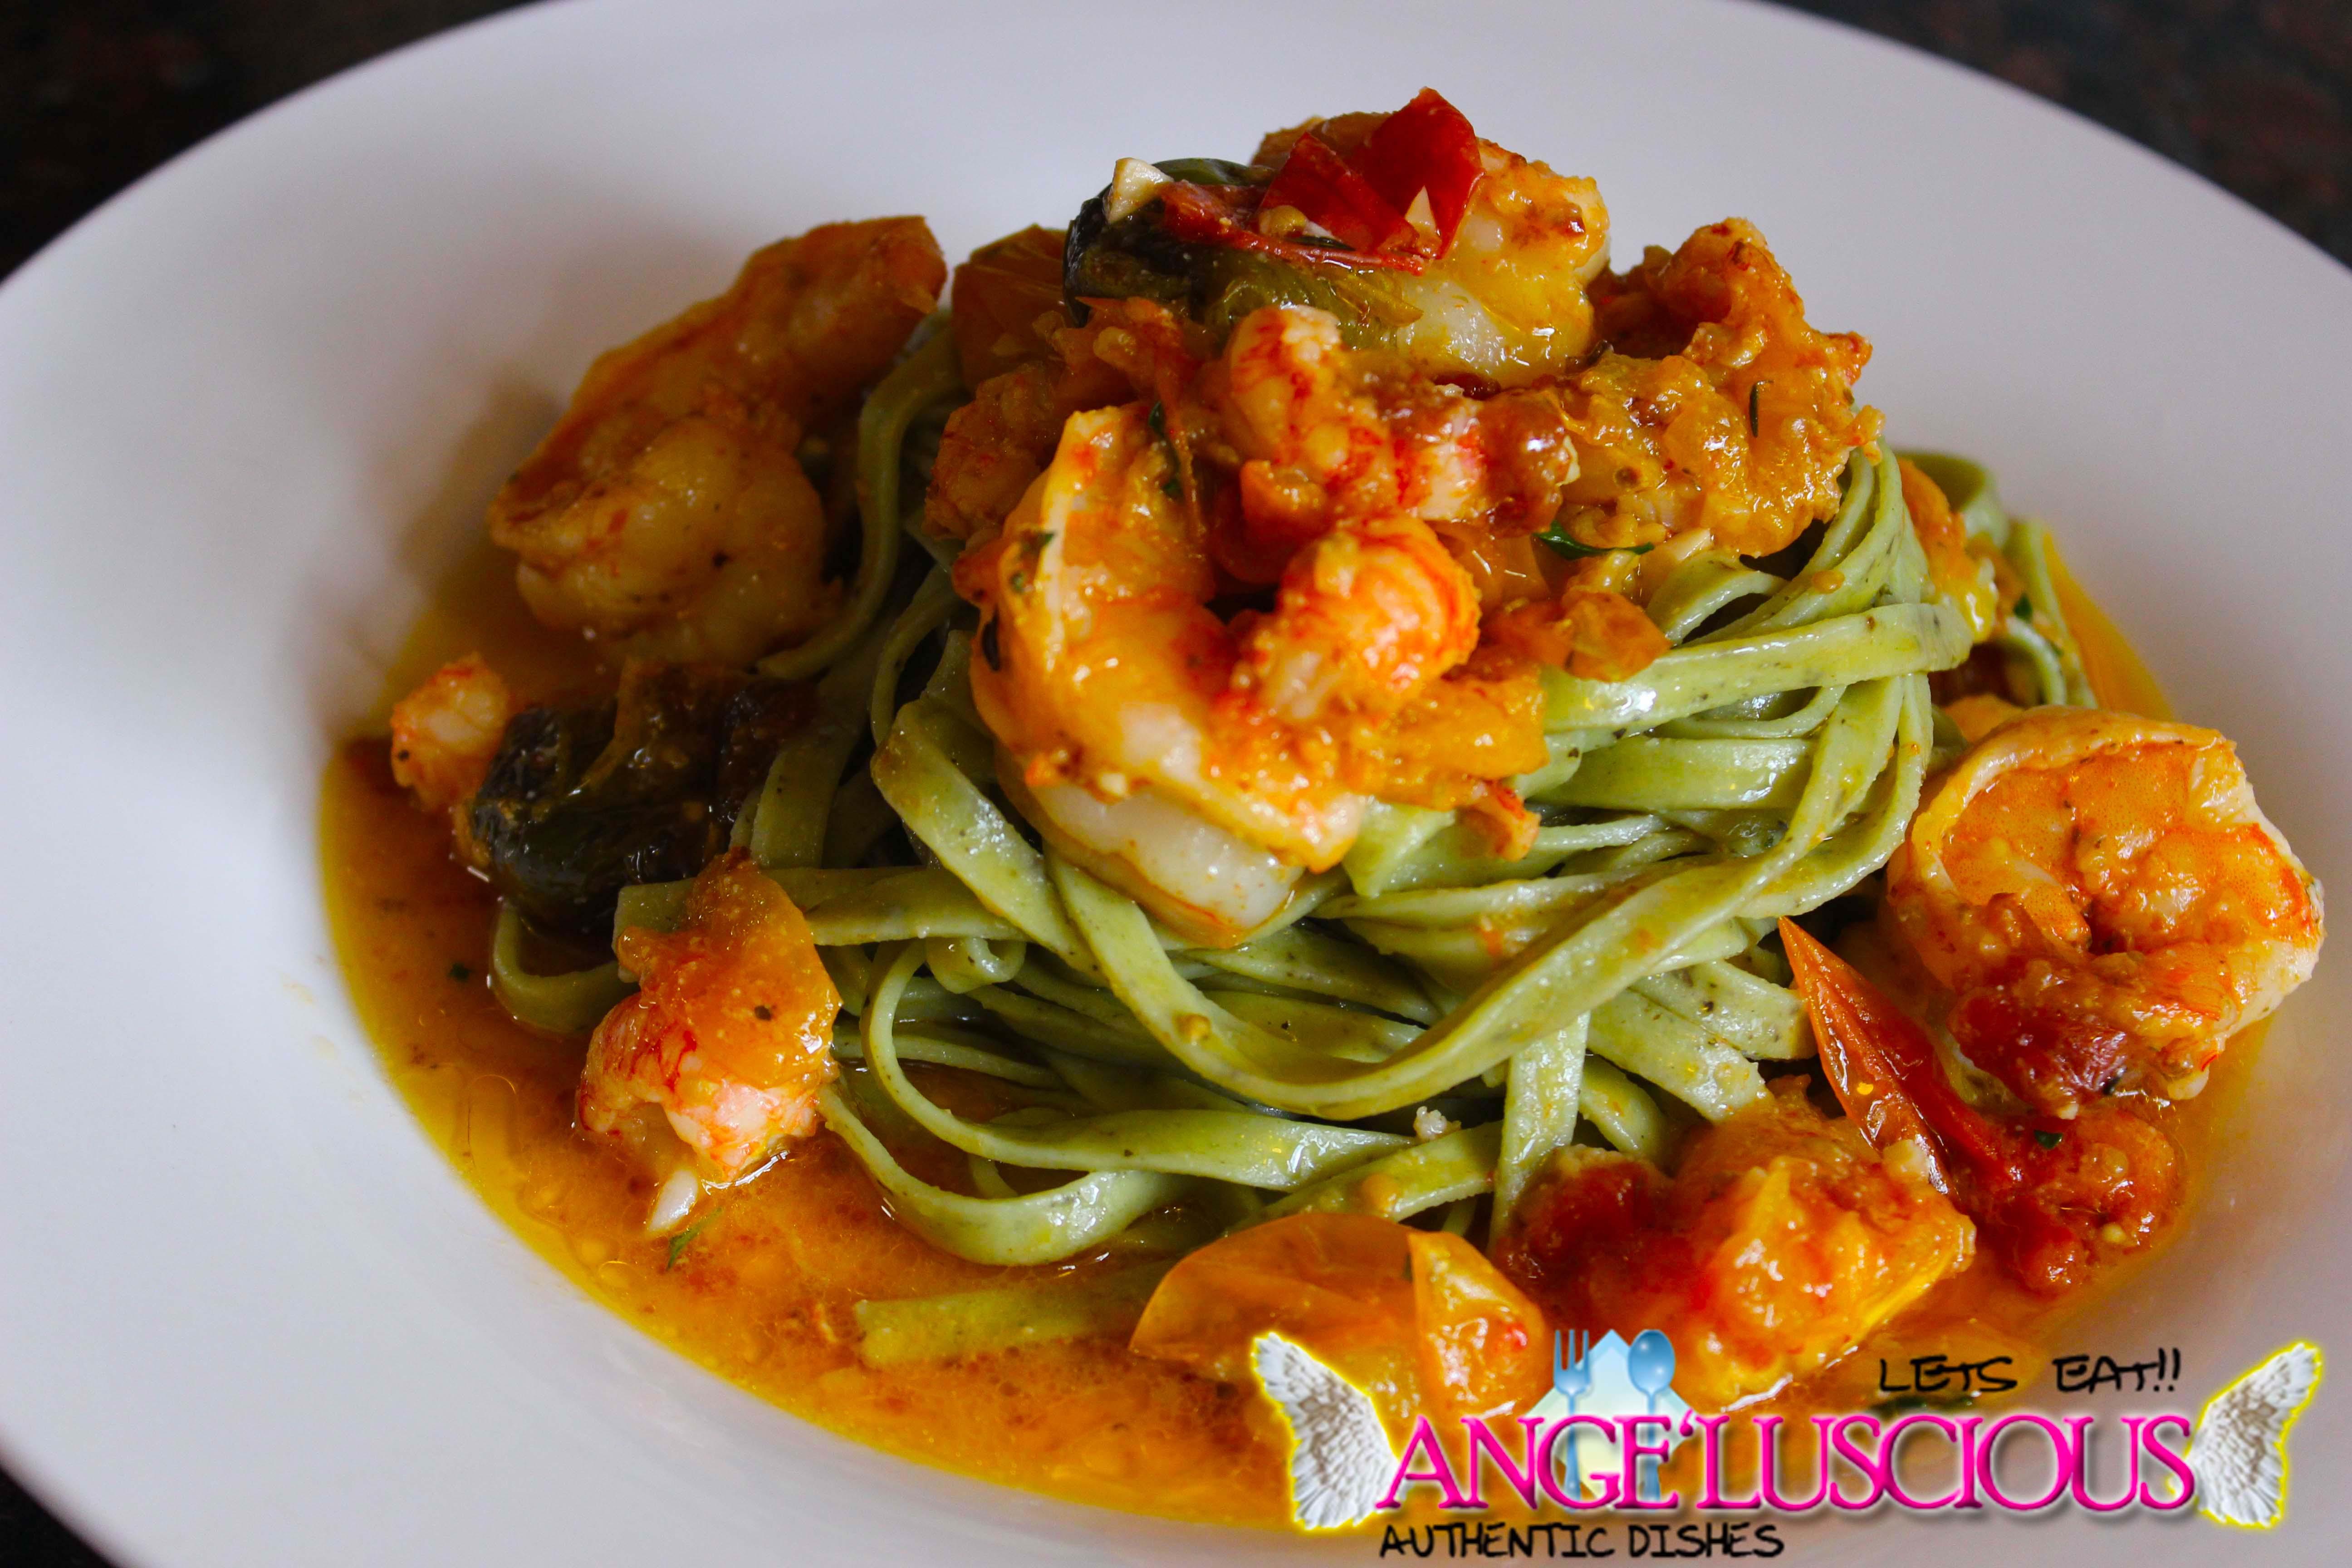 garlic shrimp and langostinos wih spinach fettucine IMG_7530